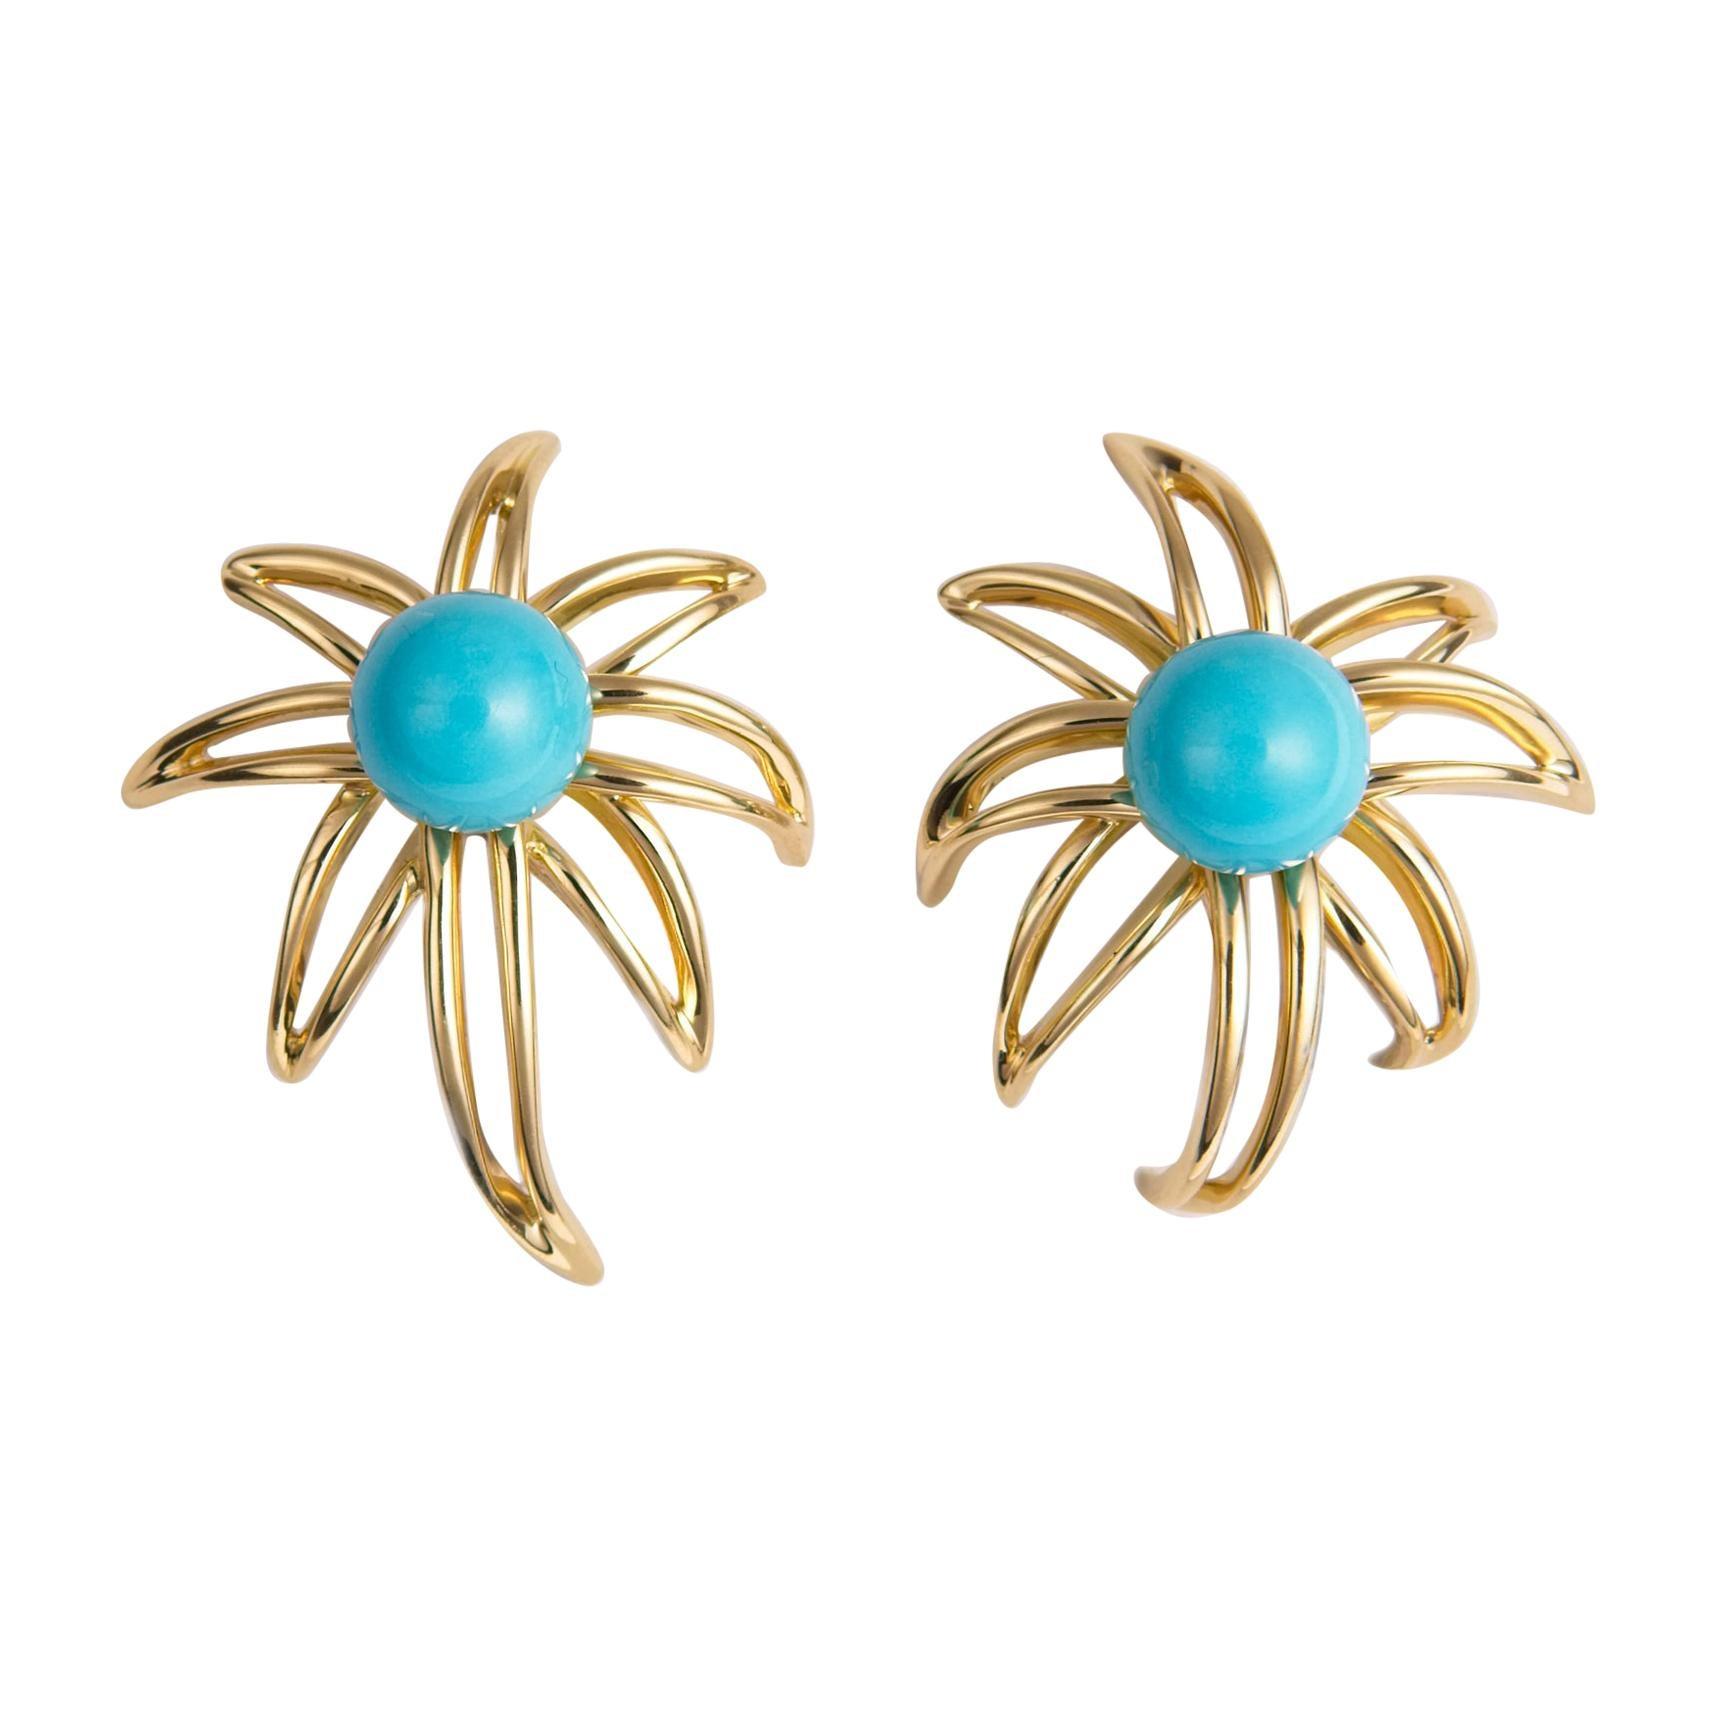 Tiffany & Co. Turquoise Fireworks Earrings